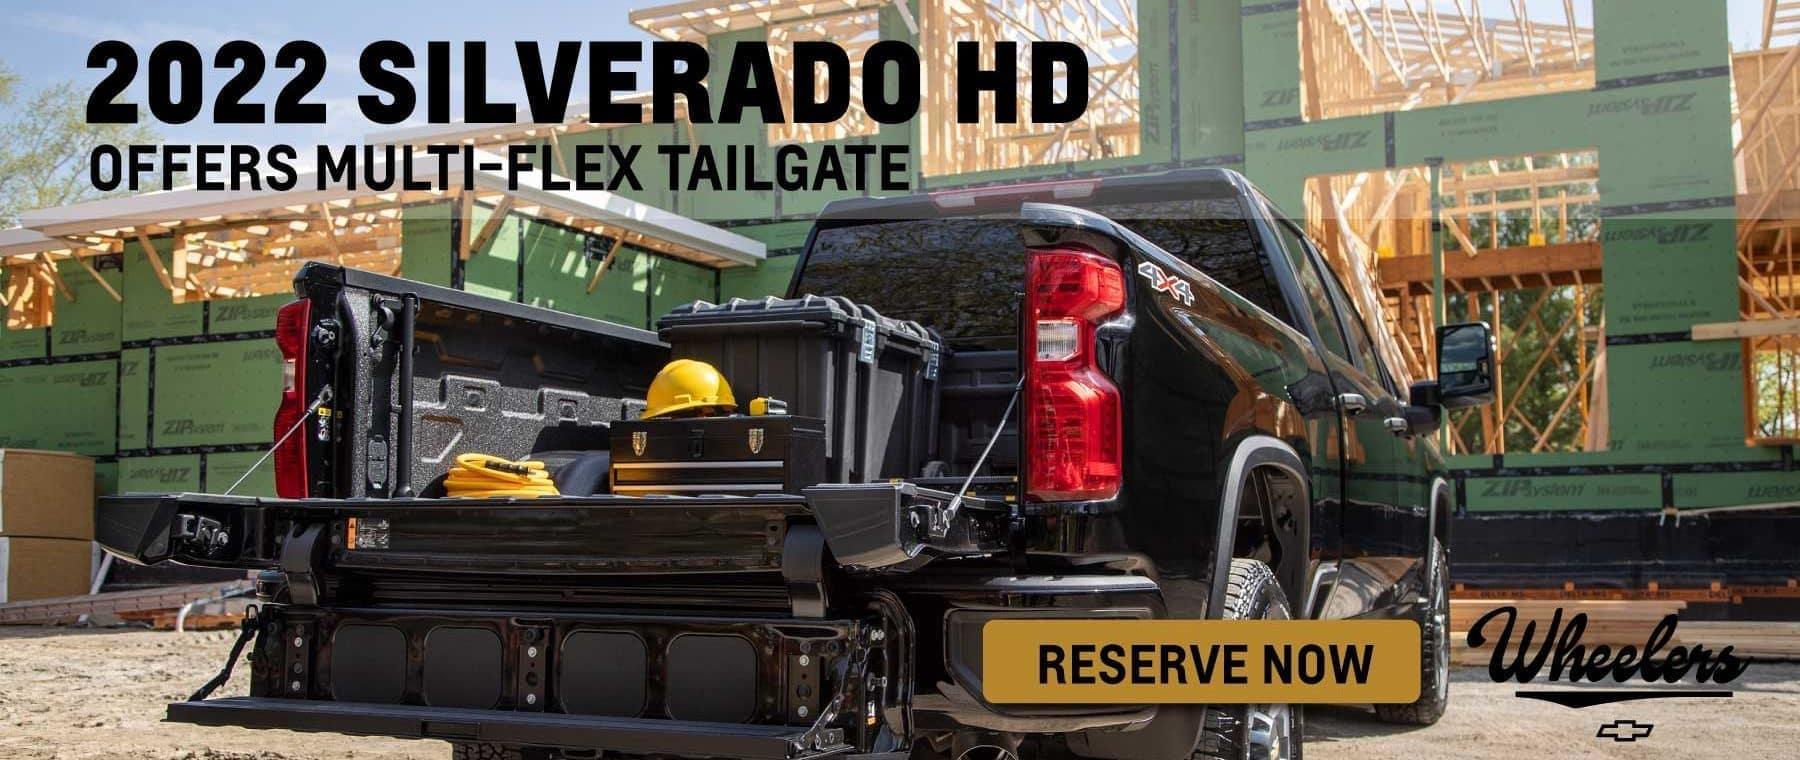 2022-Chevrolet-Silverado-Reserve-1800×760